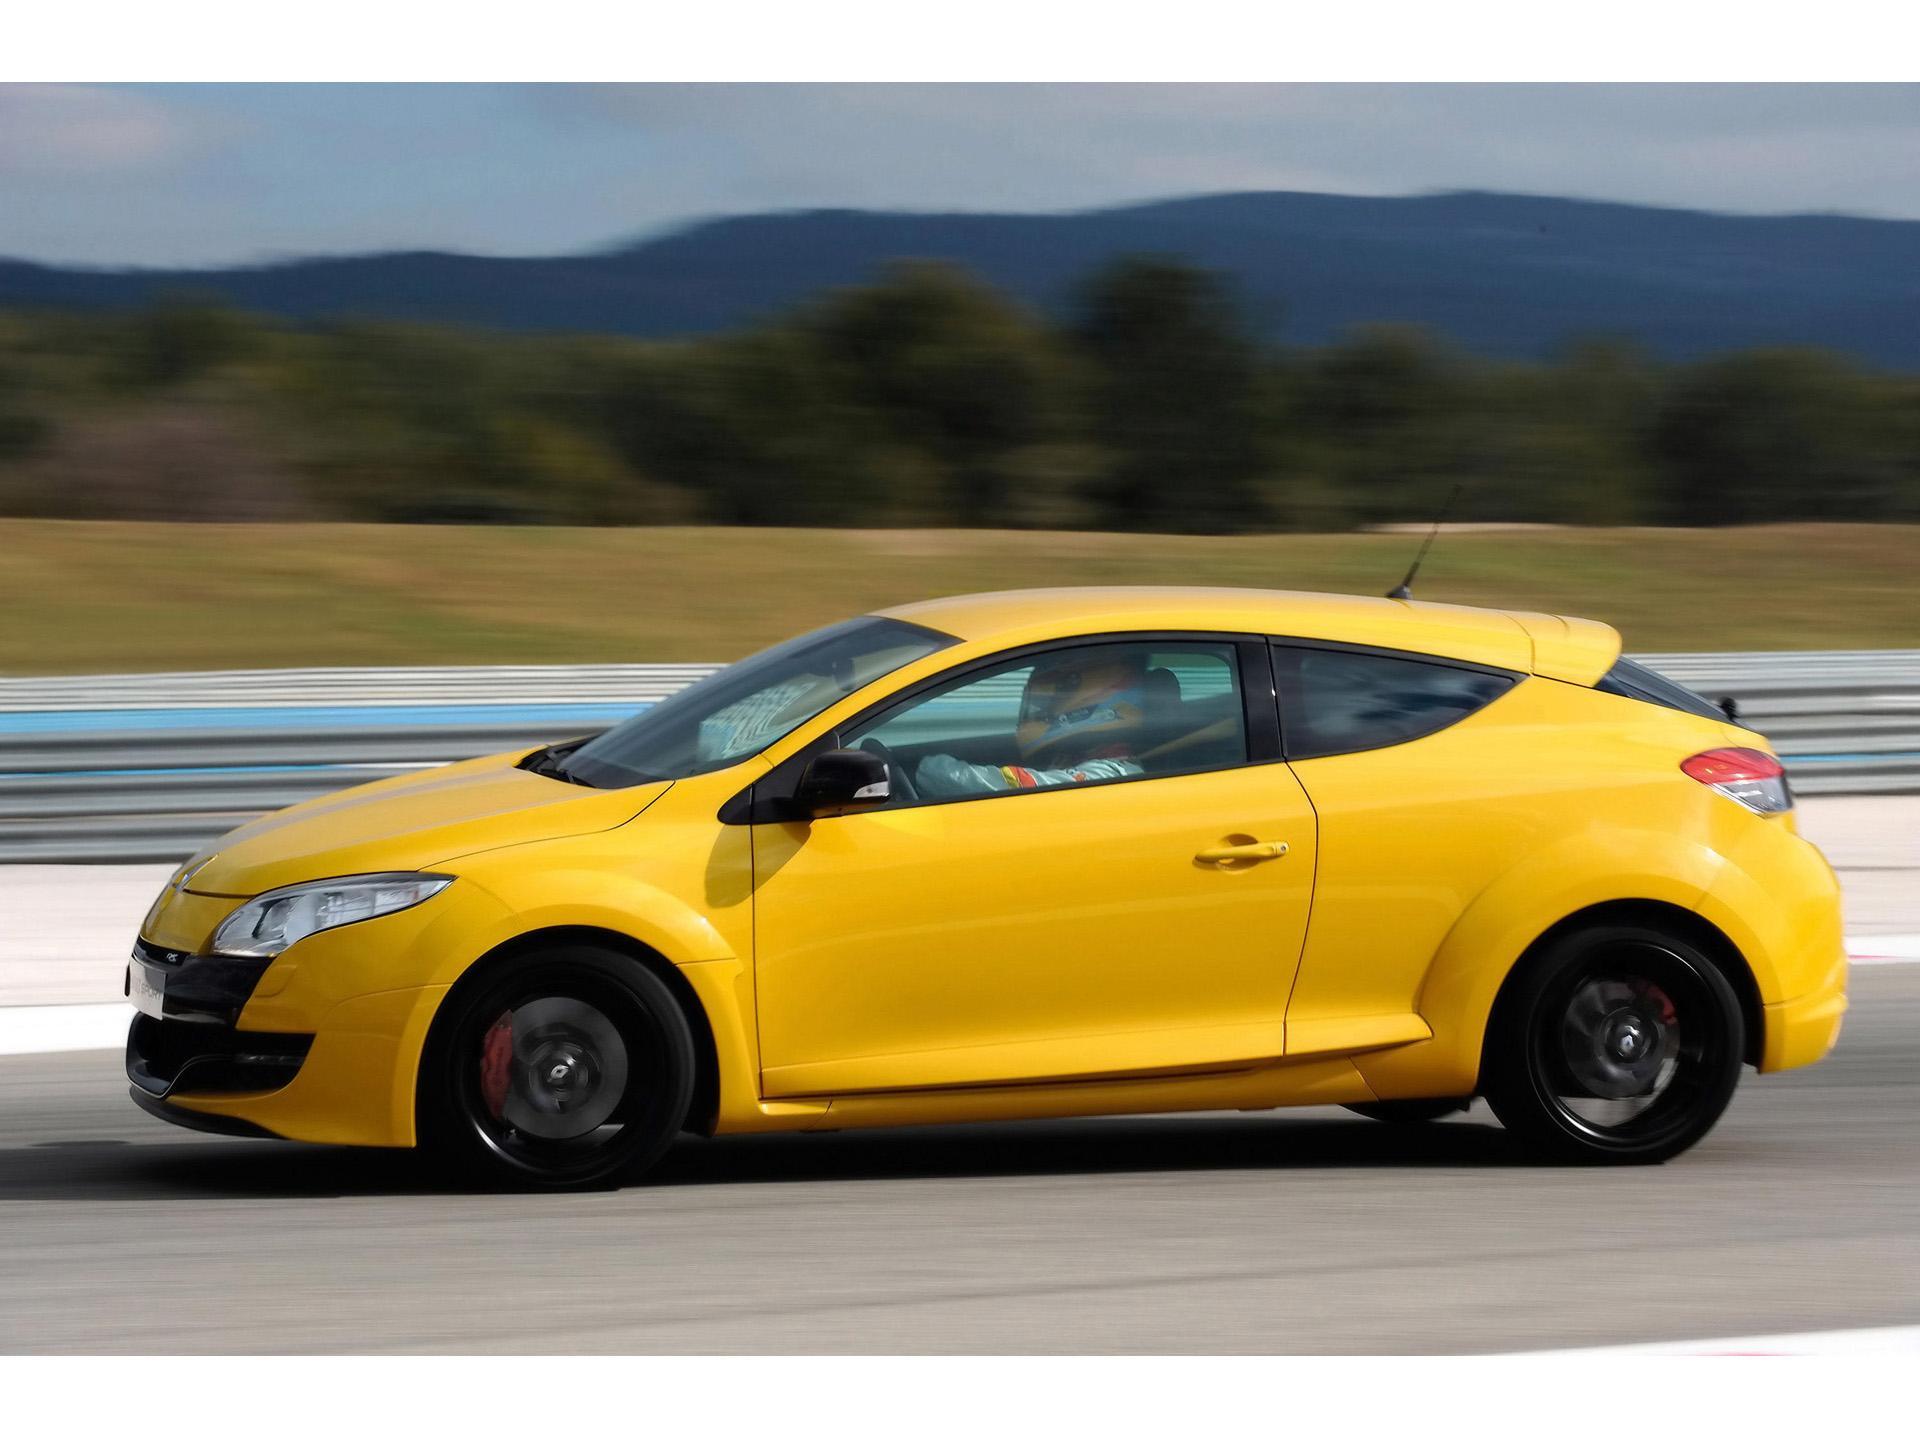 2010 Renault Megane Rs News And Information Com